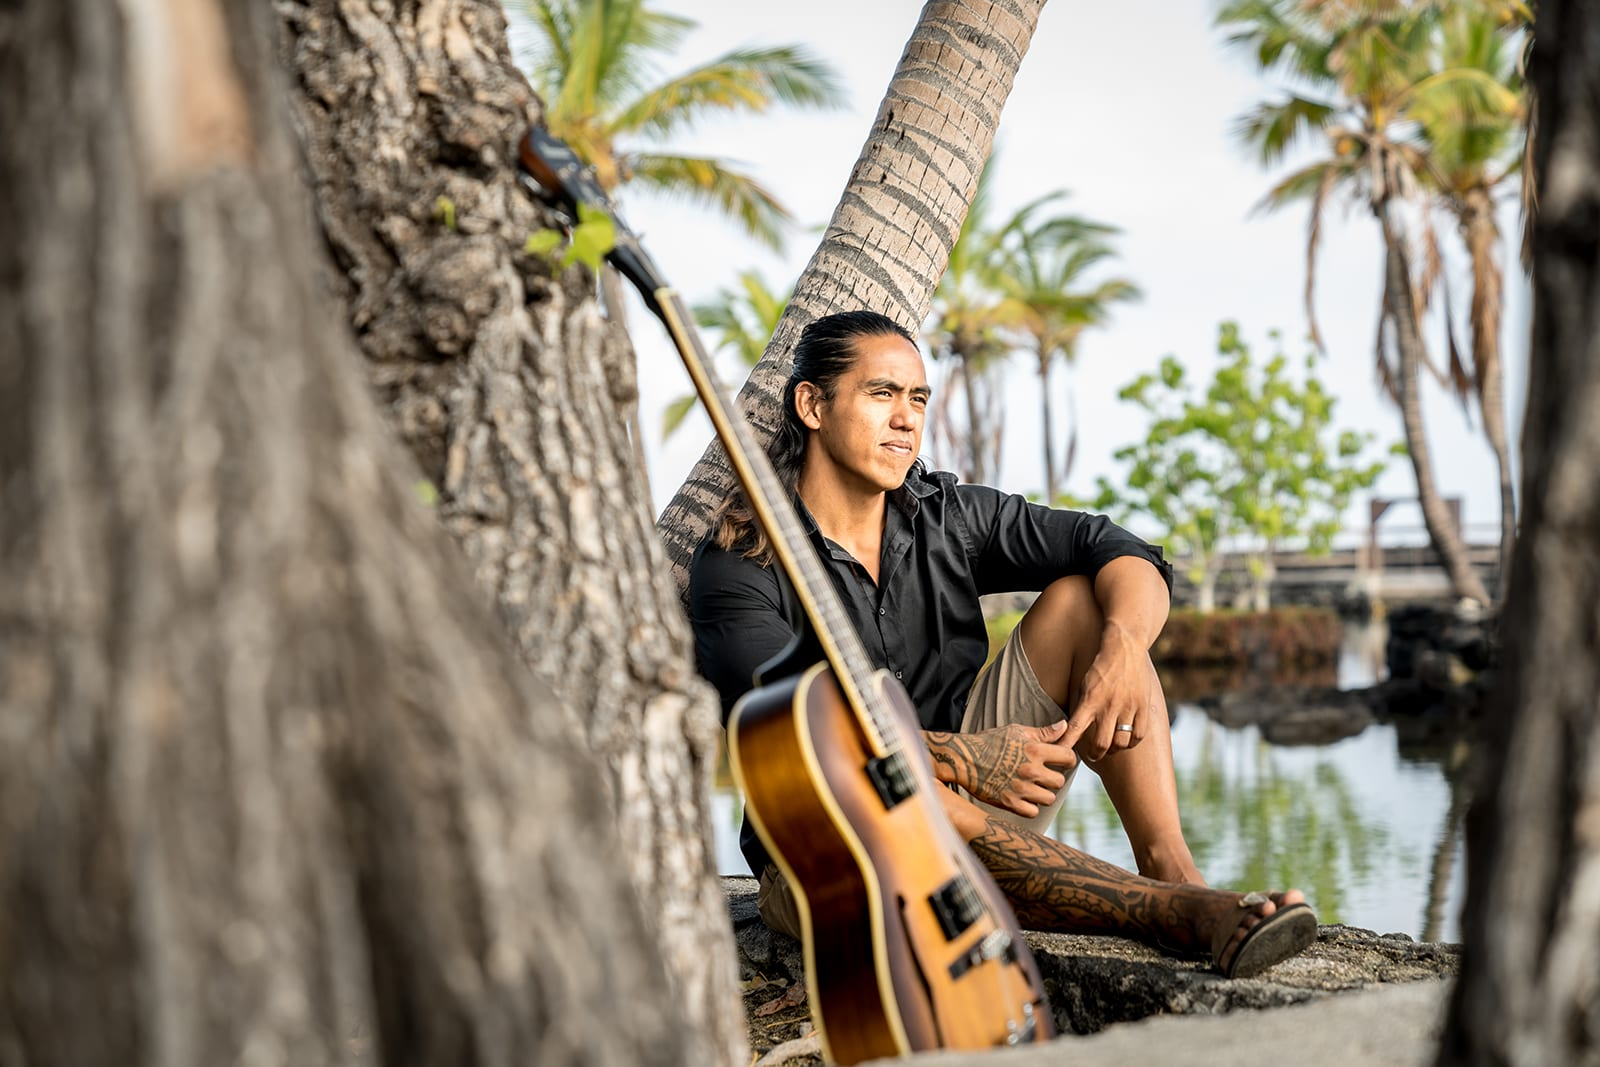 Big-Island-Musician-Band-Photographer-Artist-Portrait-Hawaii-2.jpg